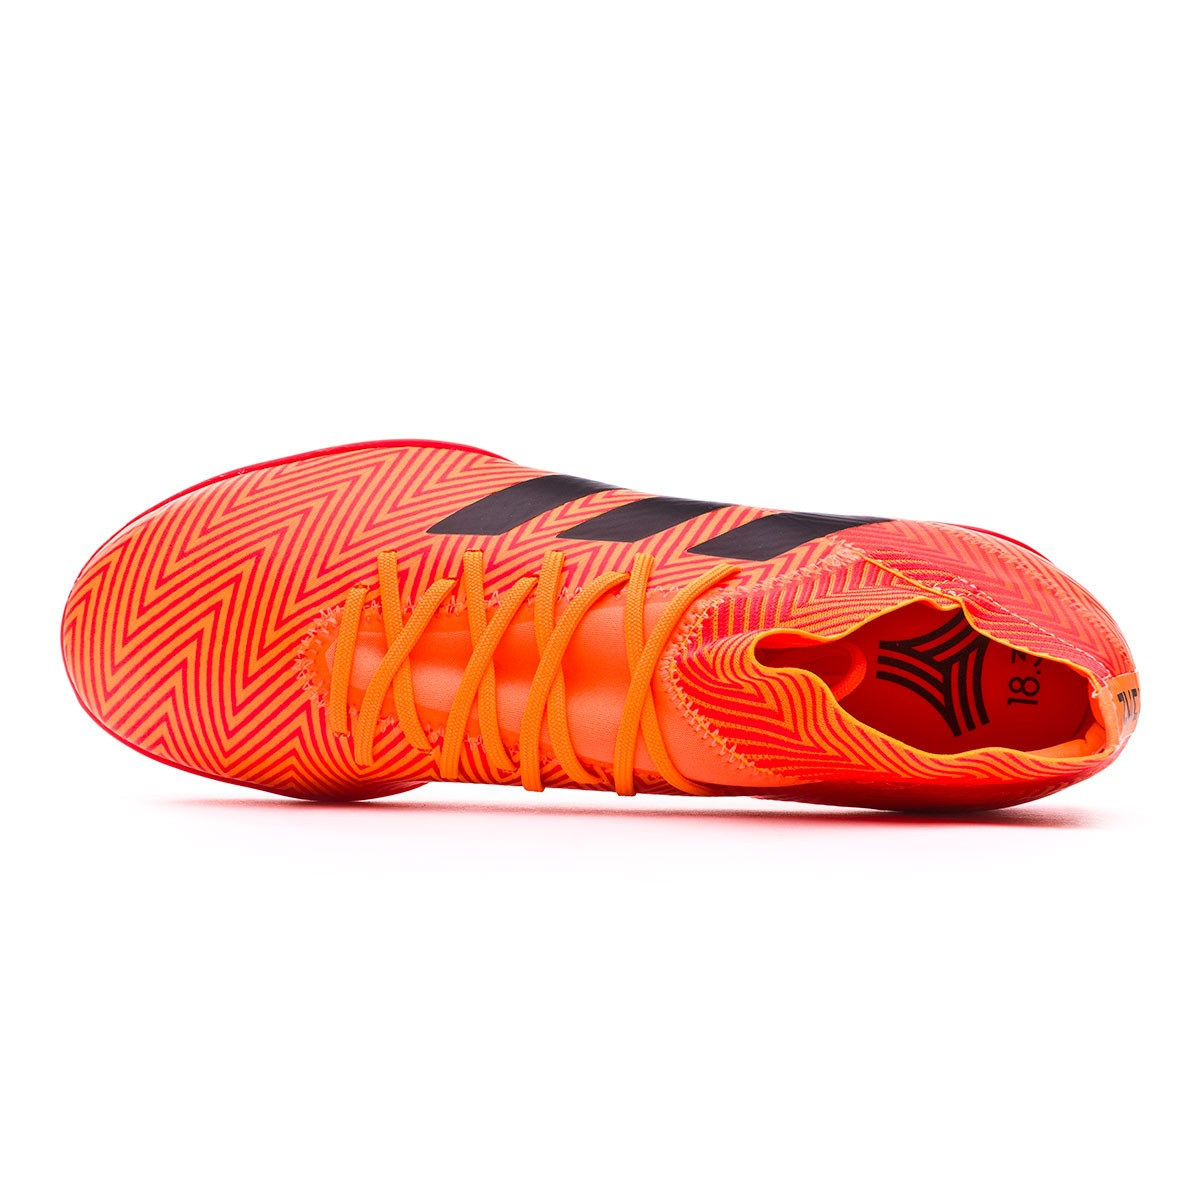 03ea25e98 Football Boot adidas Nemeziz Tango 18.3 Turf Zest-Black-Solar red - Tienda  de fútbol Fútbol Emotion